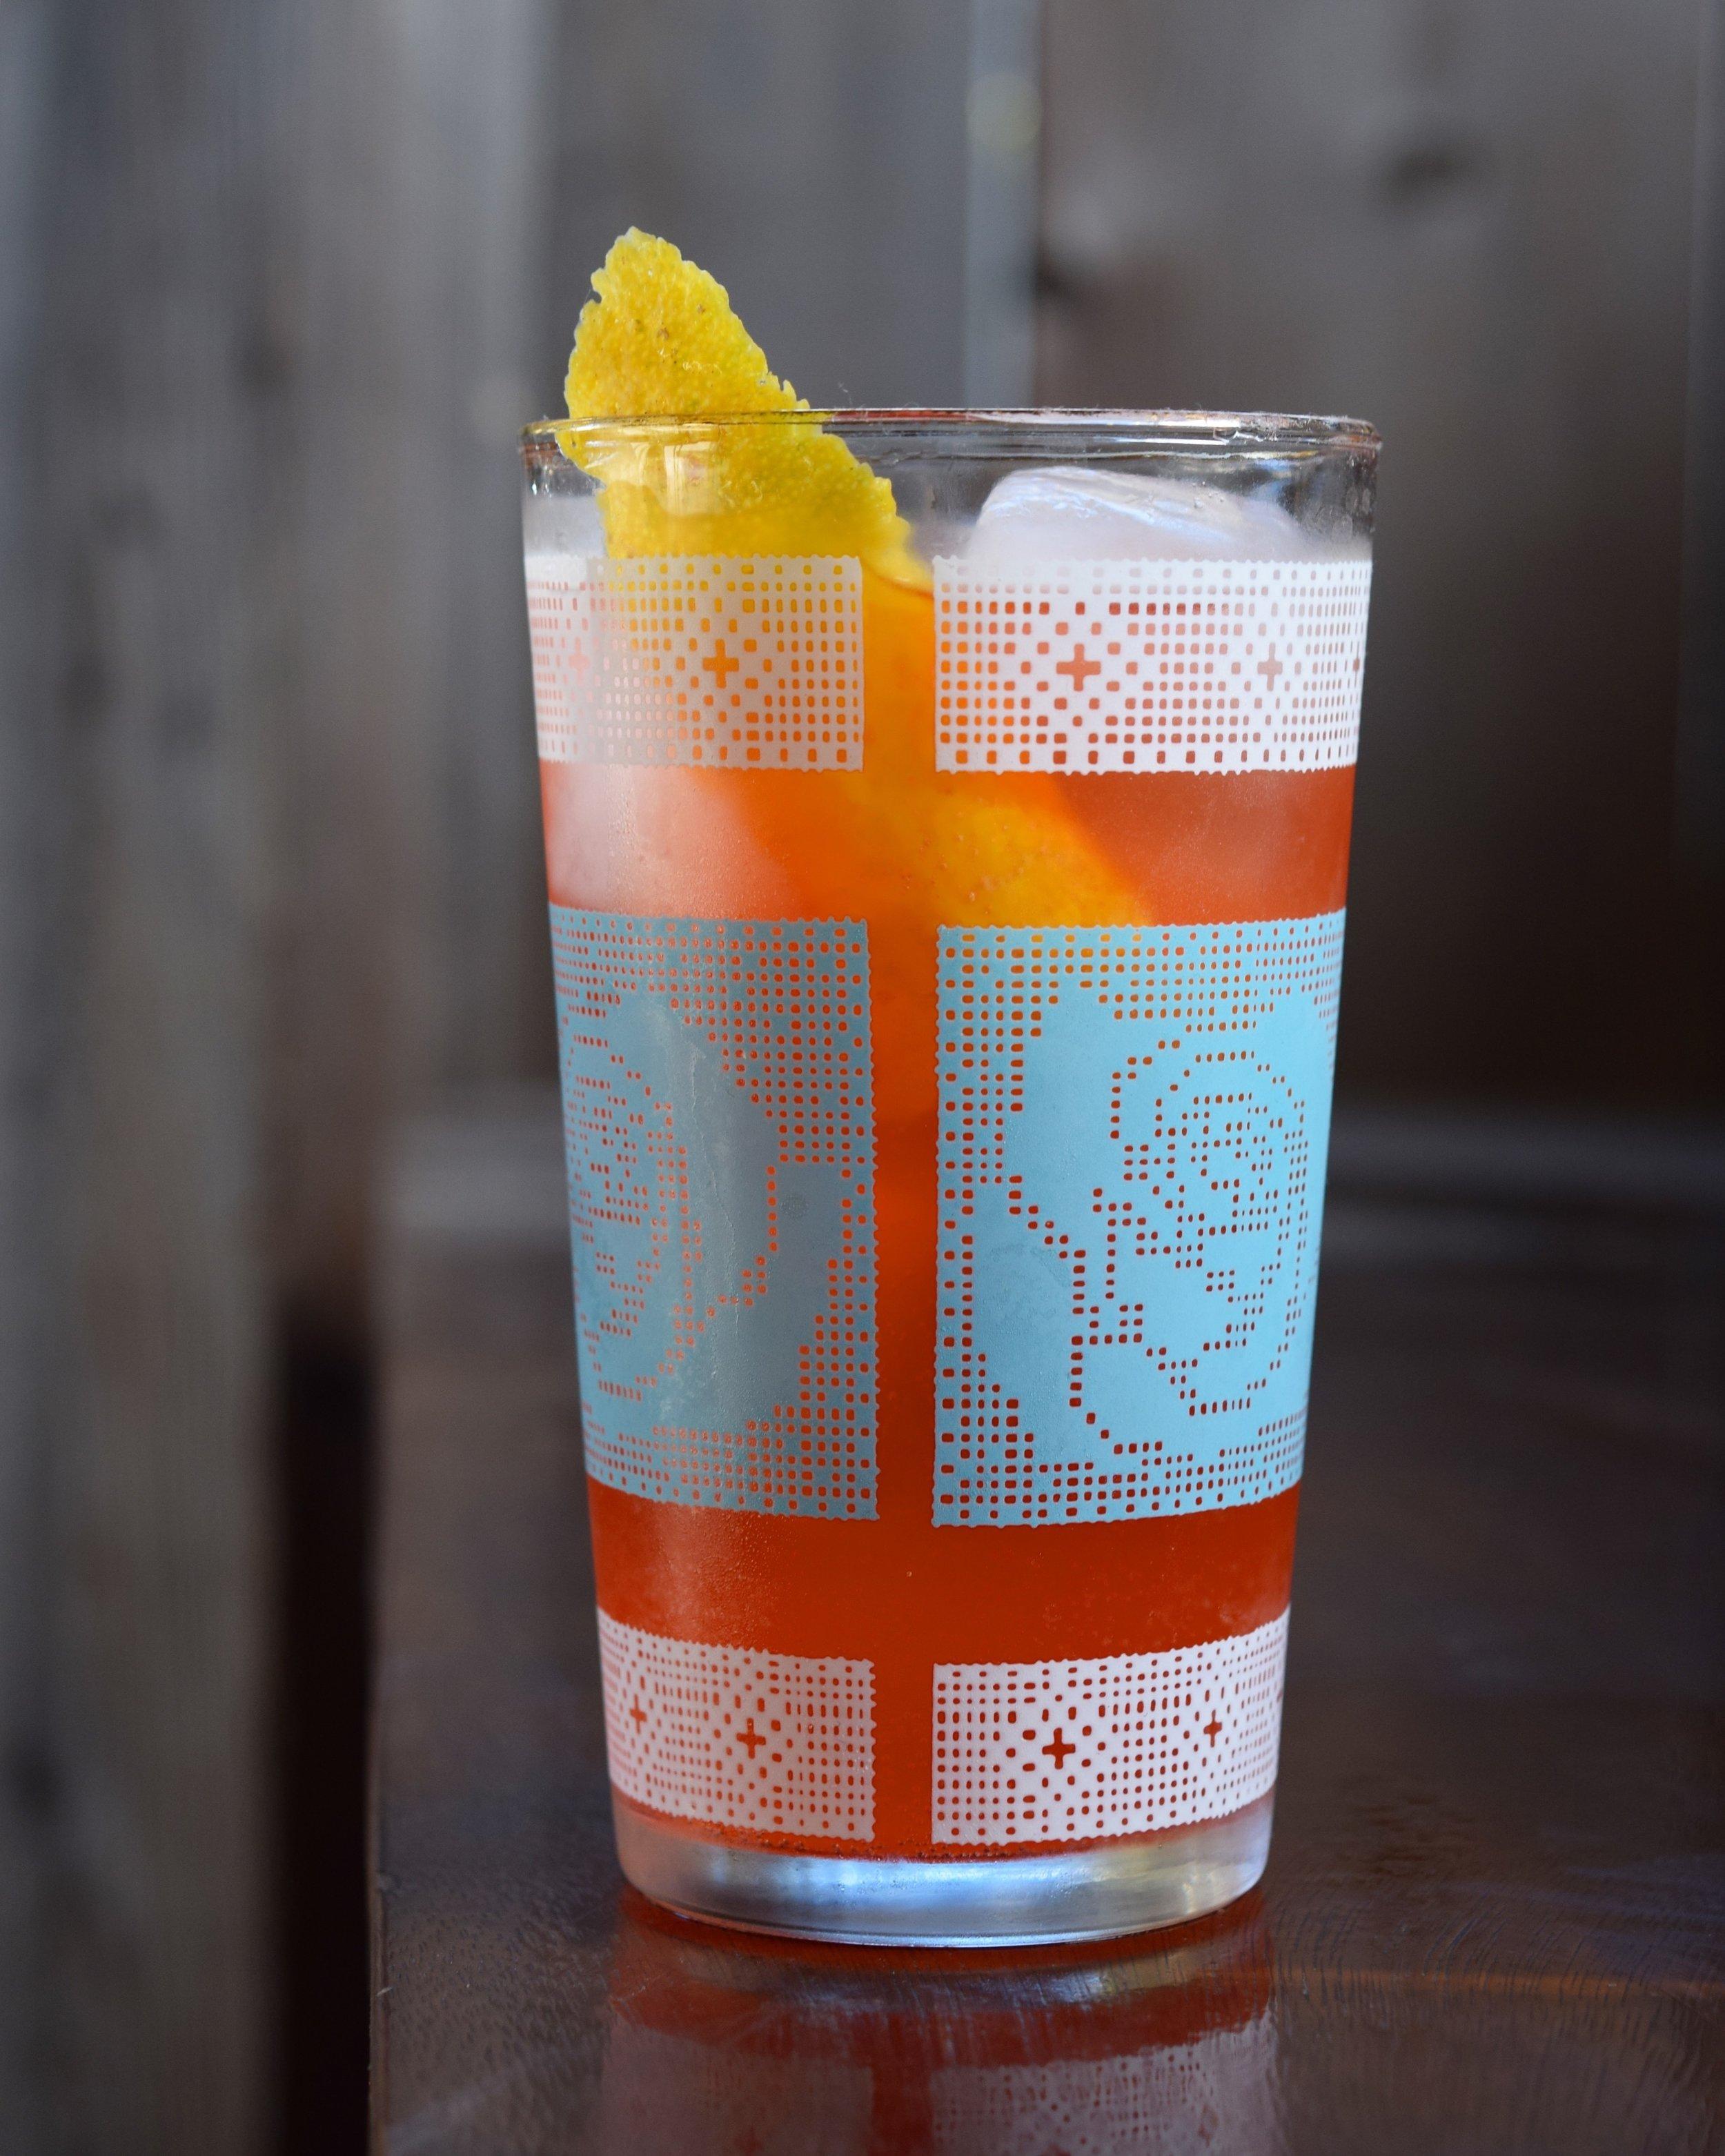 LAYOVER - 1.5 oz gin1/2 oz campari1/2 oz nostrum pineapple turmeric ginger shrub1/2 oz lemon juice2 oz soda waterBuild over ice.